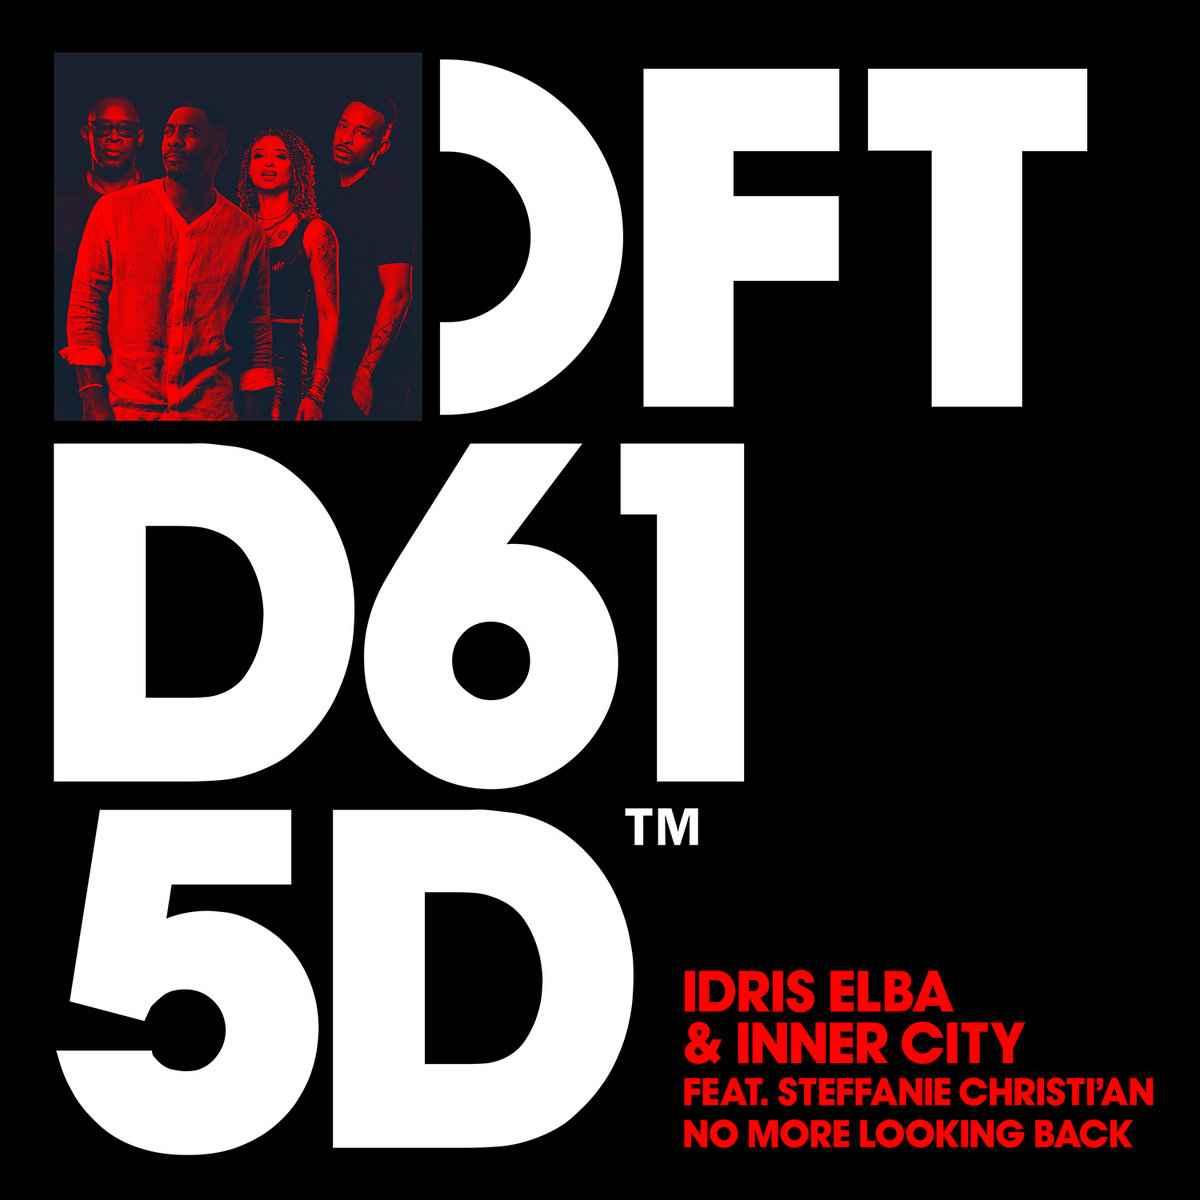 Idris Elba & Inner City Ft. Steffanie Christi'an – No More Looking Back